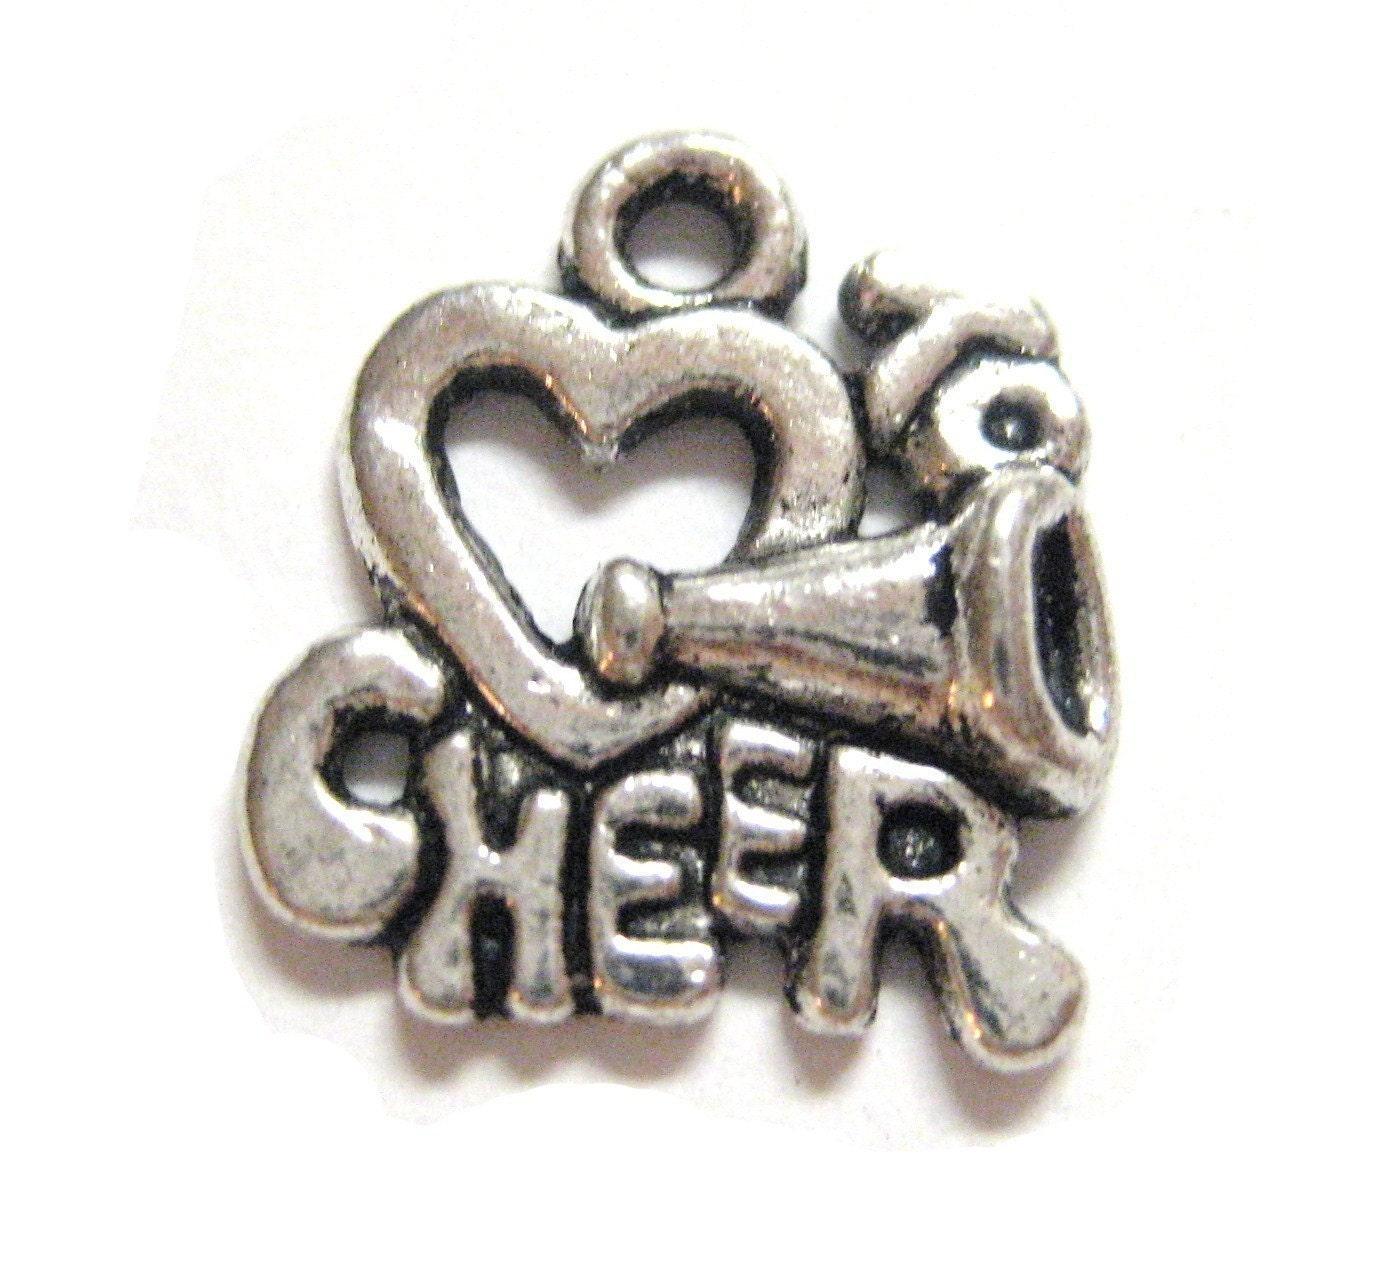 Cheer Charm Bracelets: 20pcs Cheerleading Cheer Charms Chear Leader Teen High School